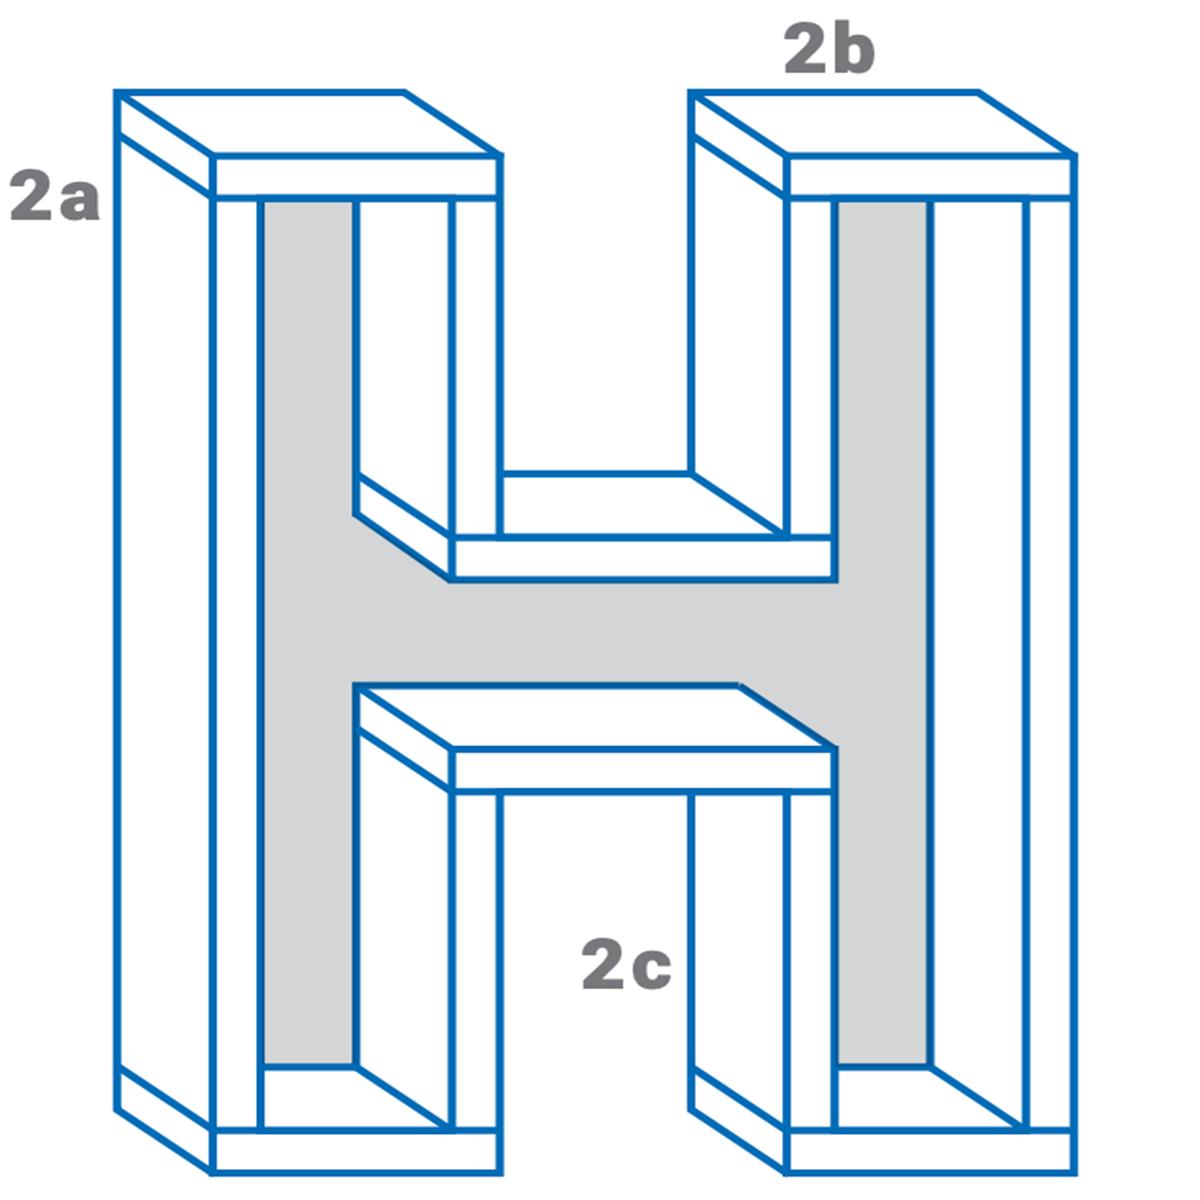 Monogram Planter - DIY Project Instructions - Harbor Freight Tools